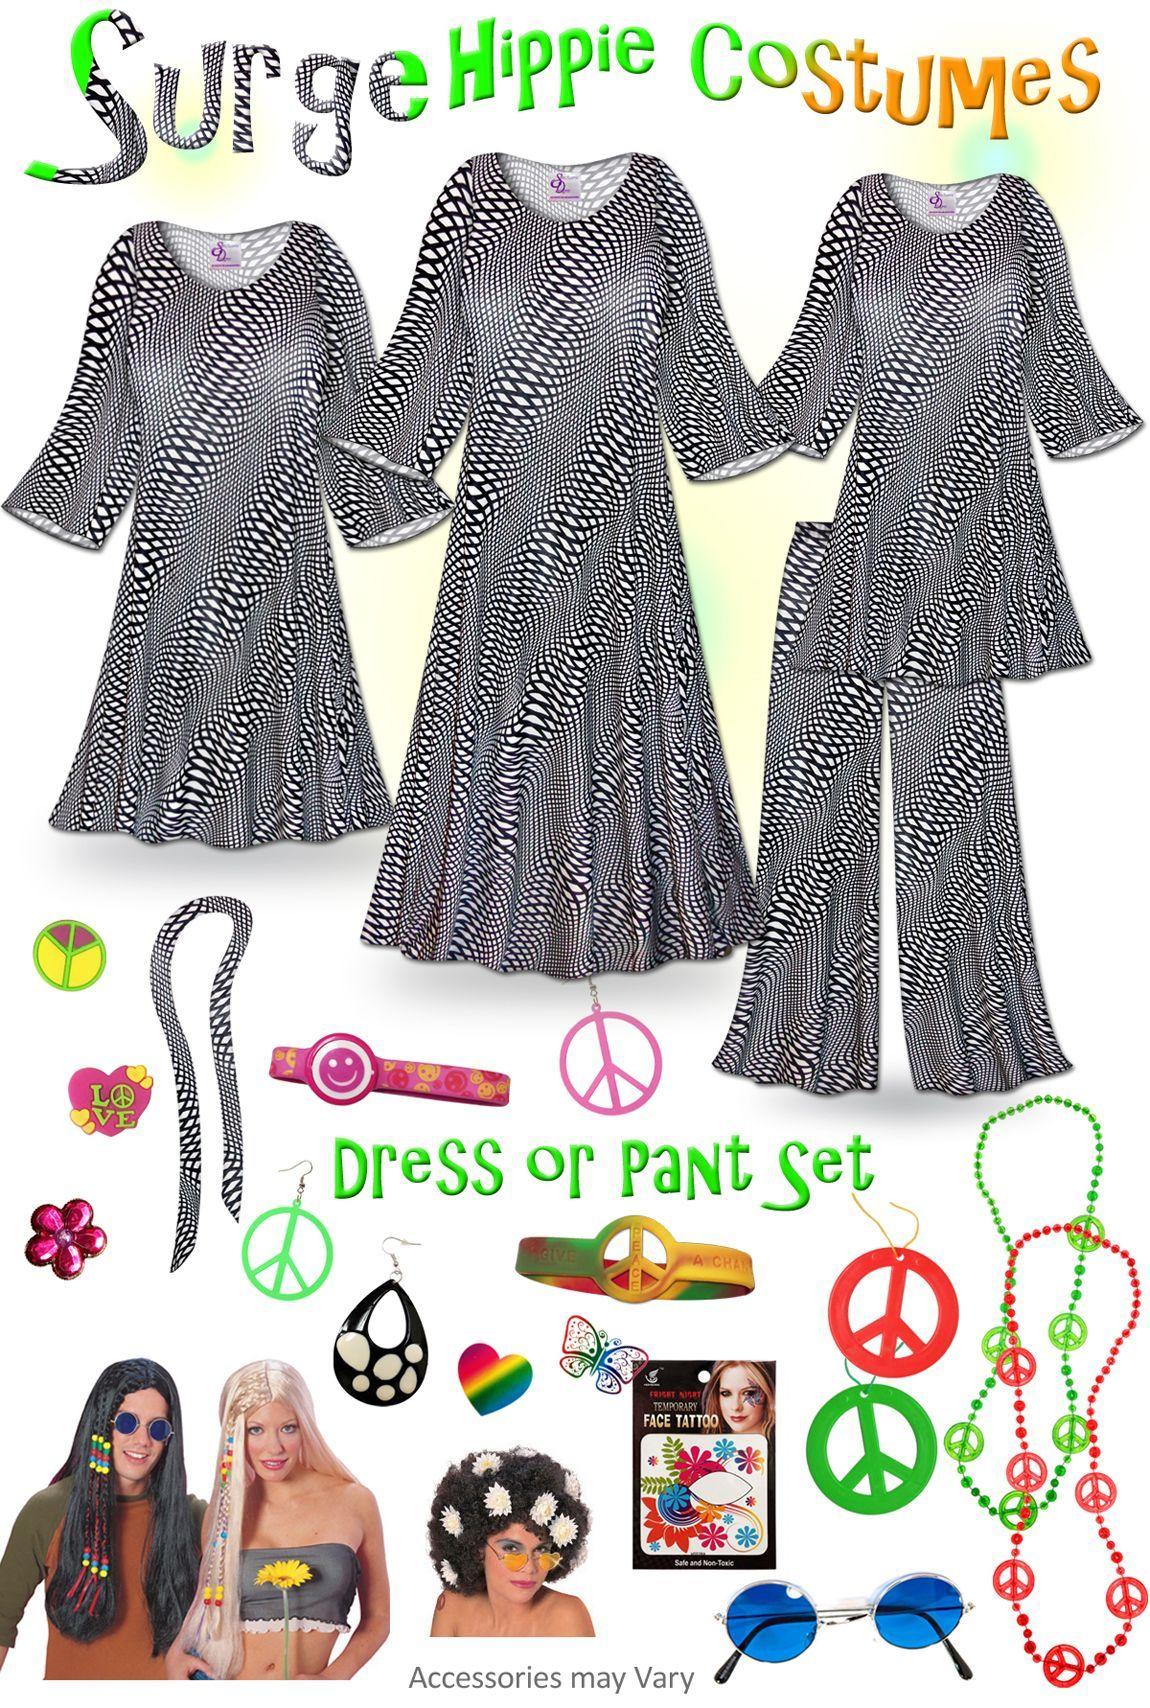 SOLD OUT! Surge Print Plus Size Hippie Costume 60 s